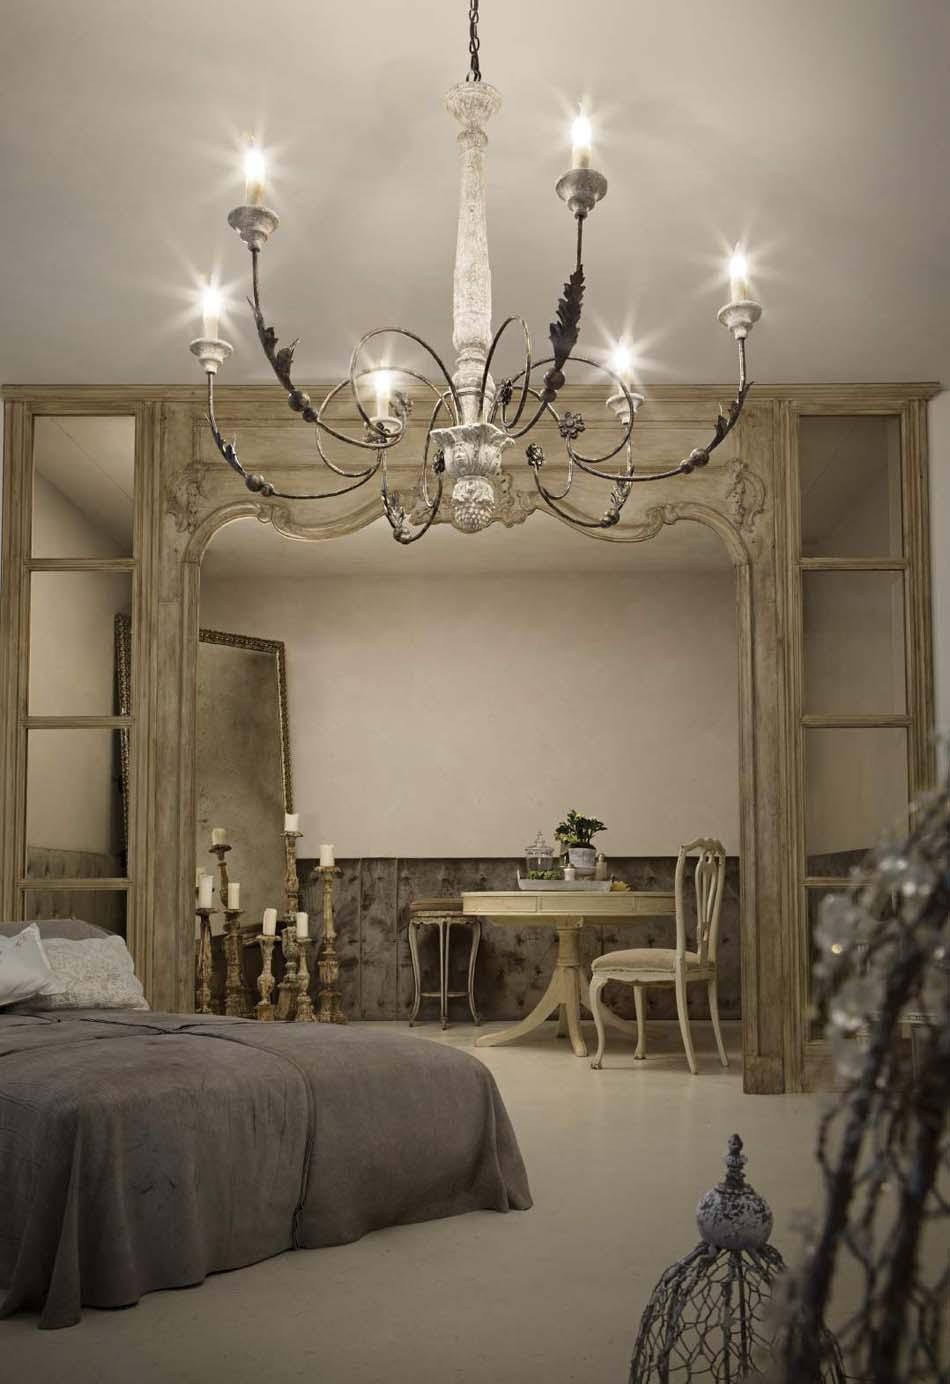 Lampade 55 sospese vintage Ideal Lux volterra – Toscana Arredamenti